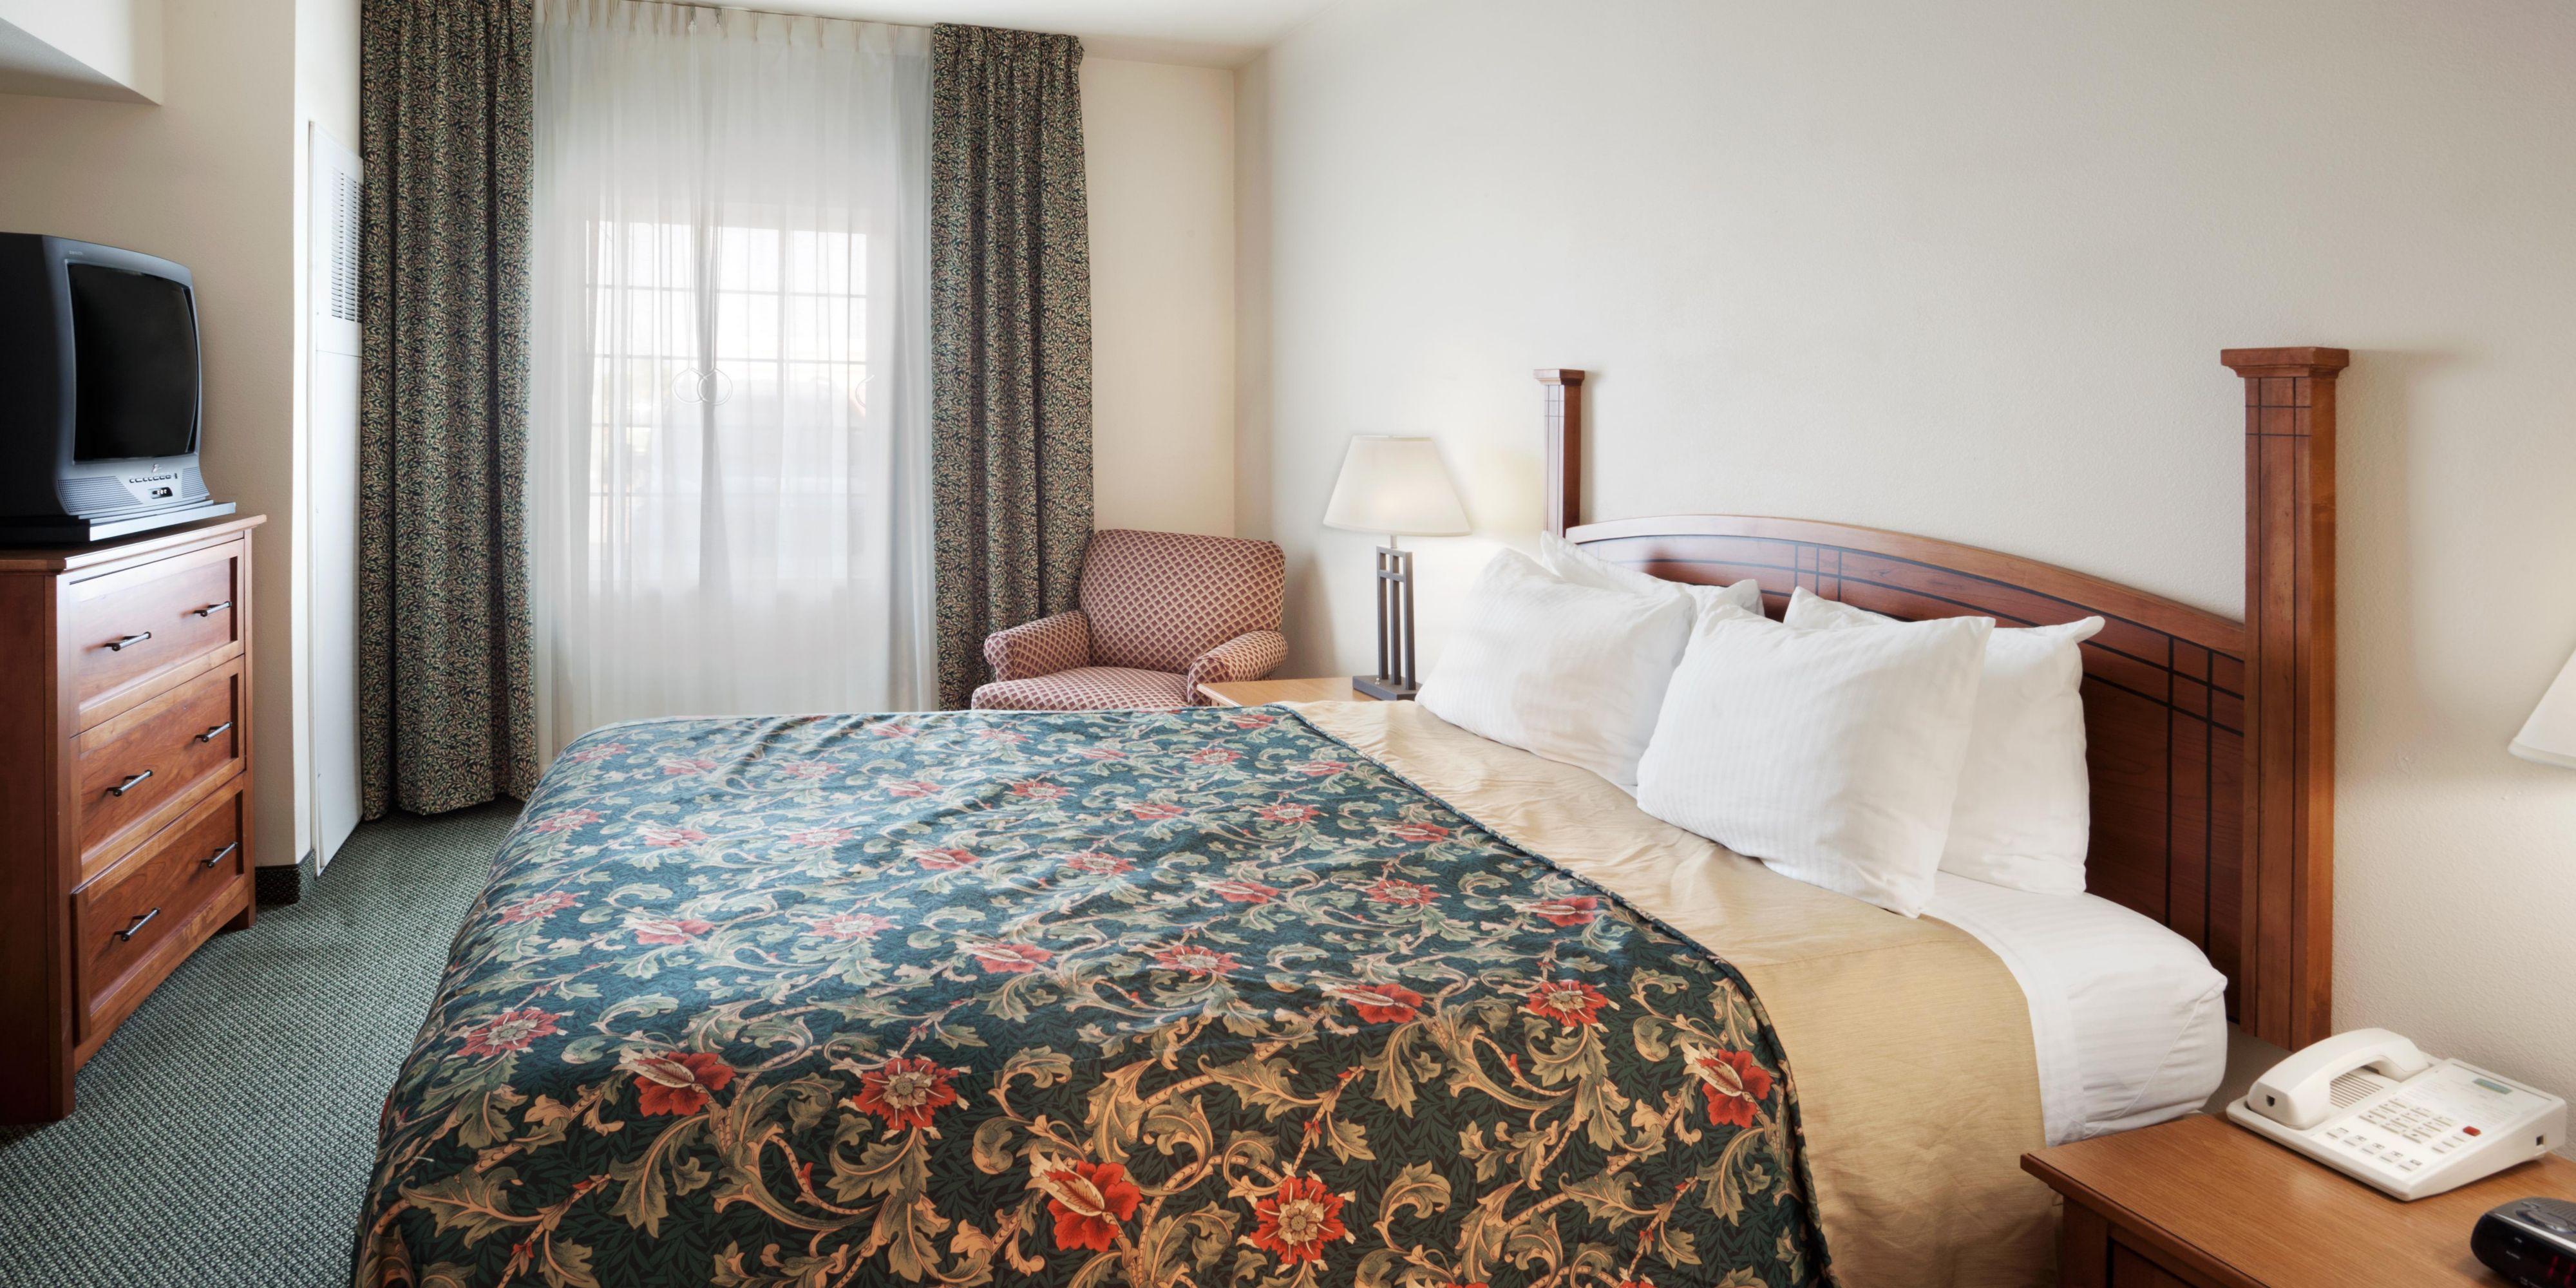 Staybridge Suites Brownsville image 1